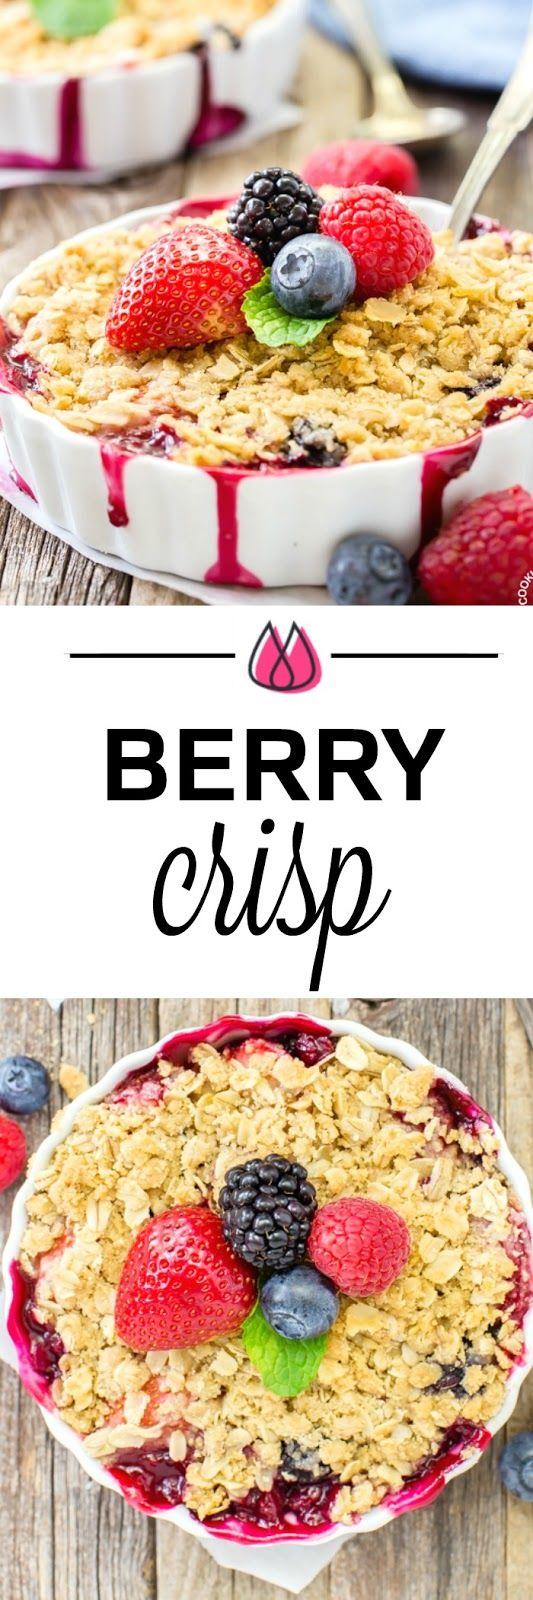 Quadruple Berry Crisp!